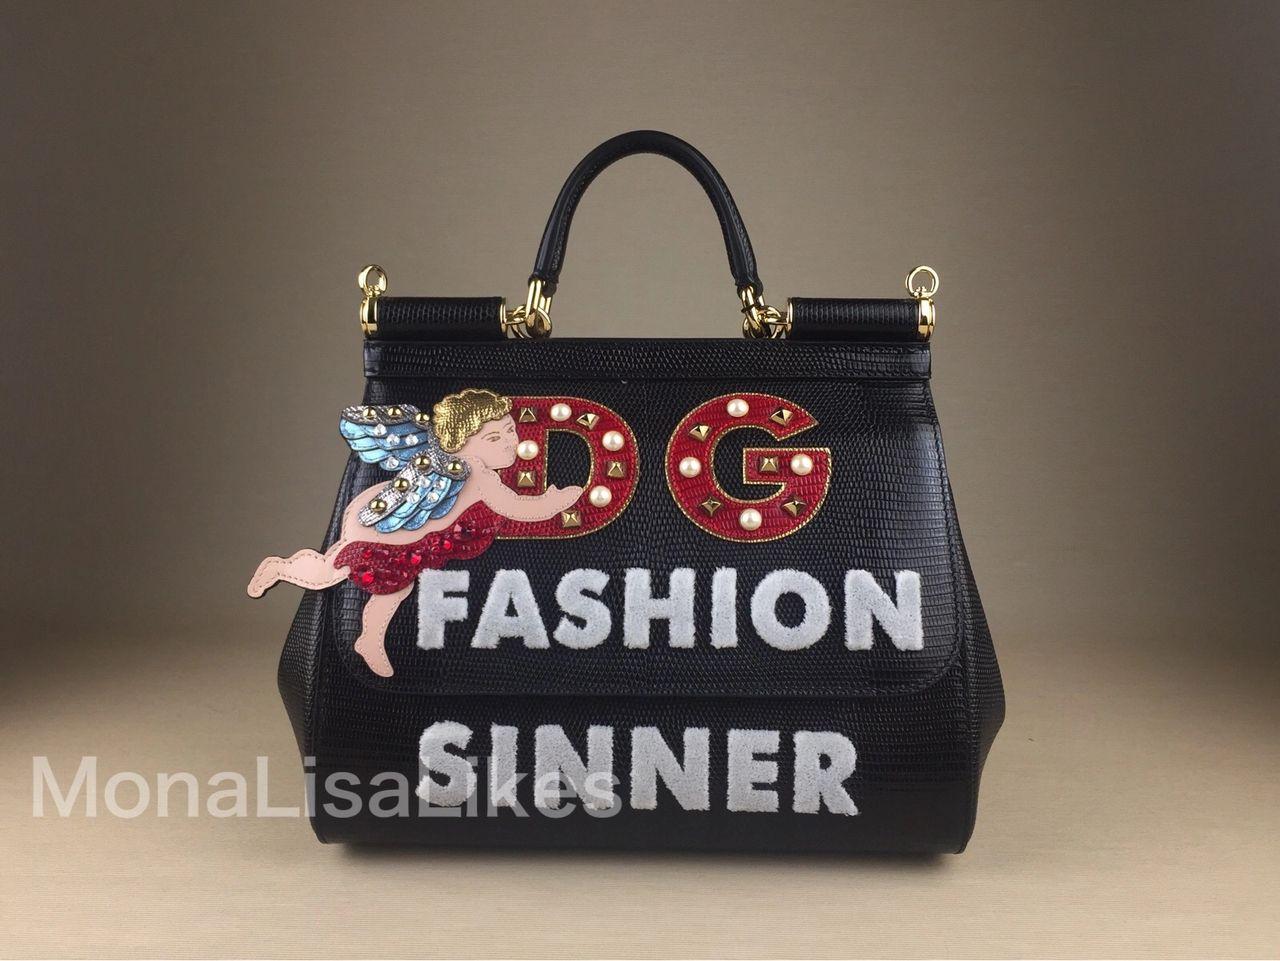 DOLCE & GABBANA angel embellished mediummiss sicily bag in black dauphine leather